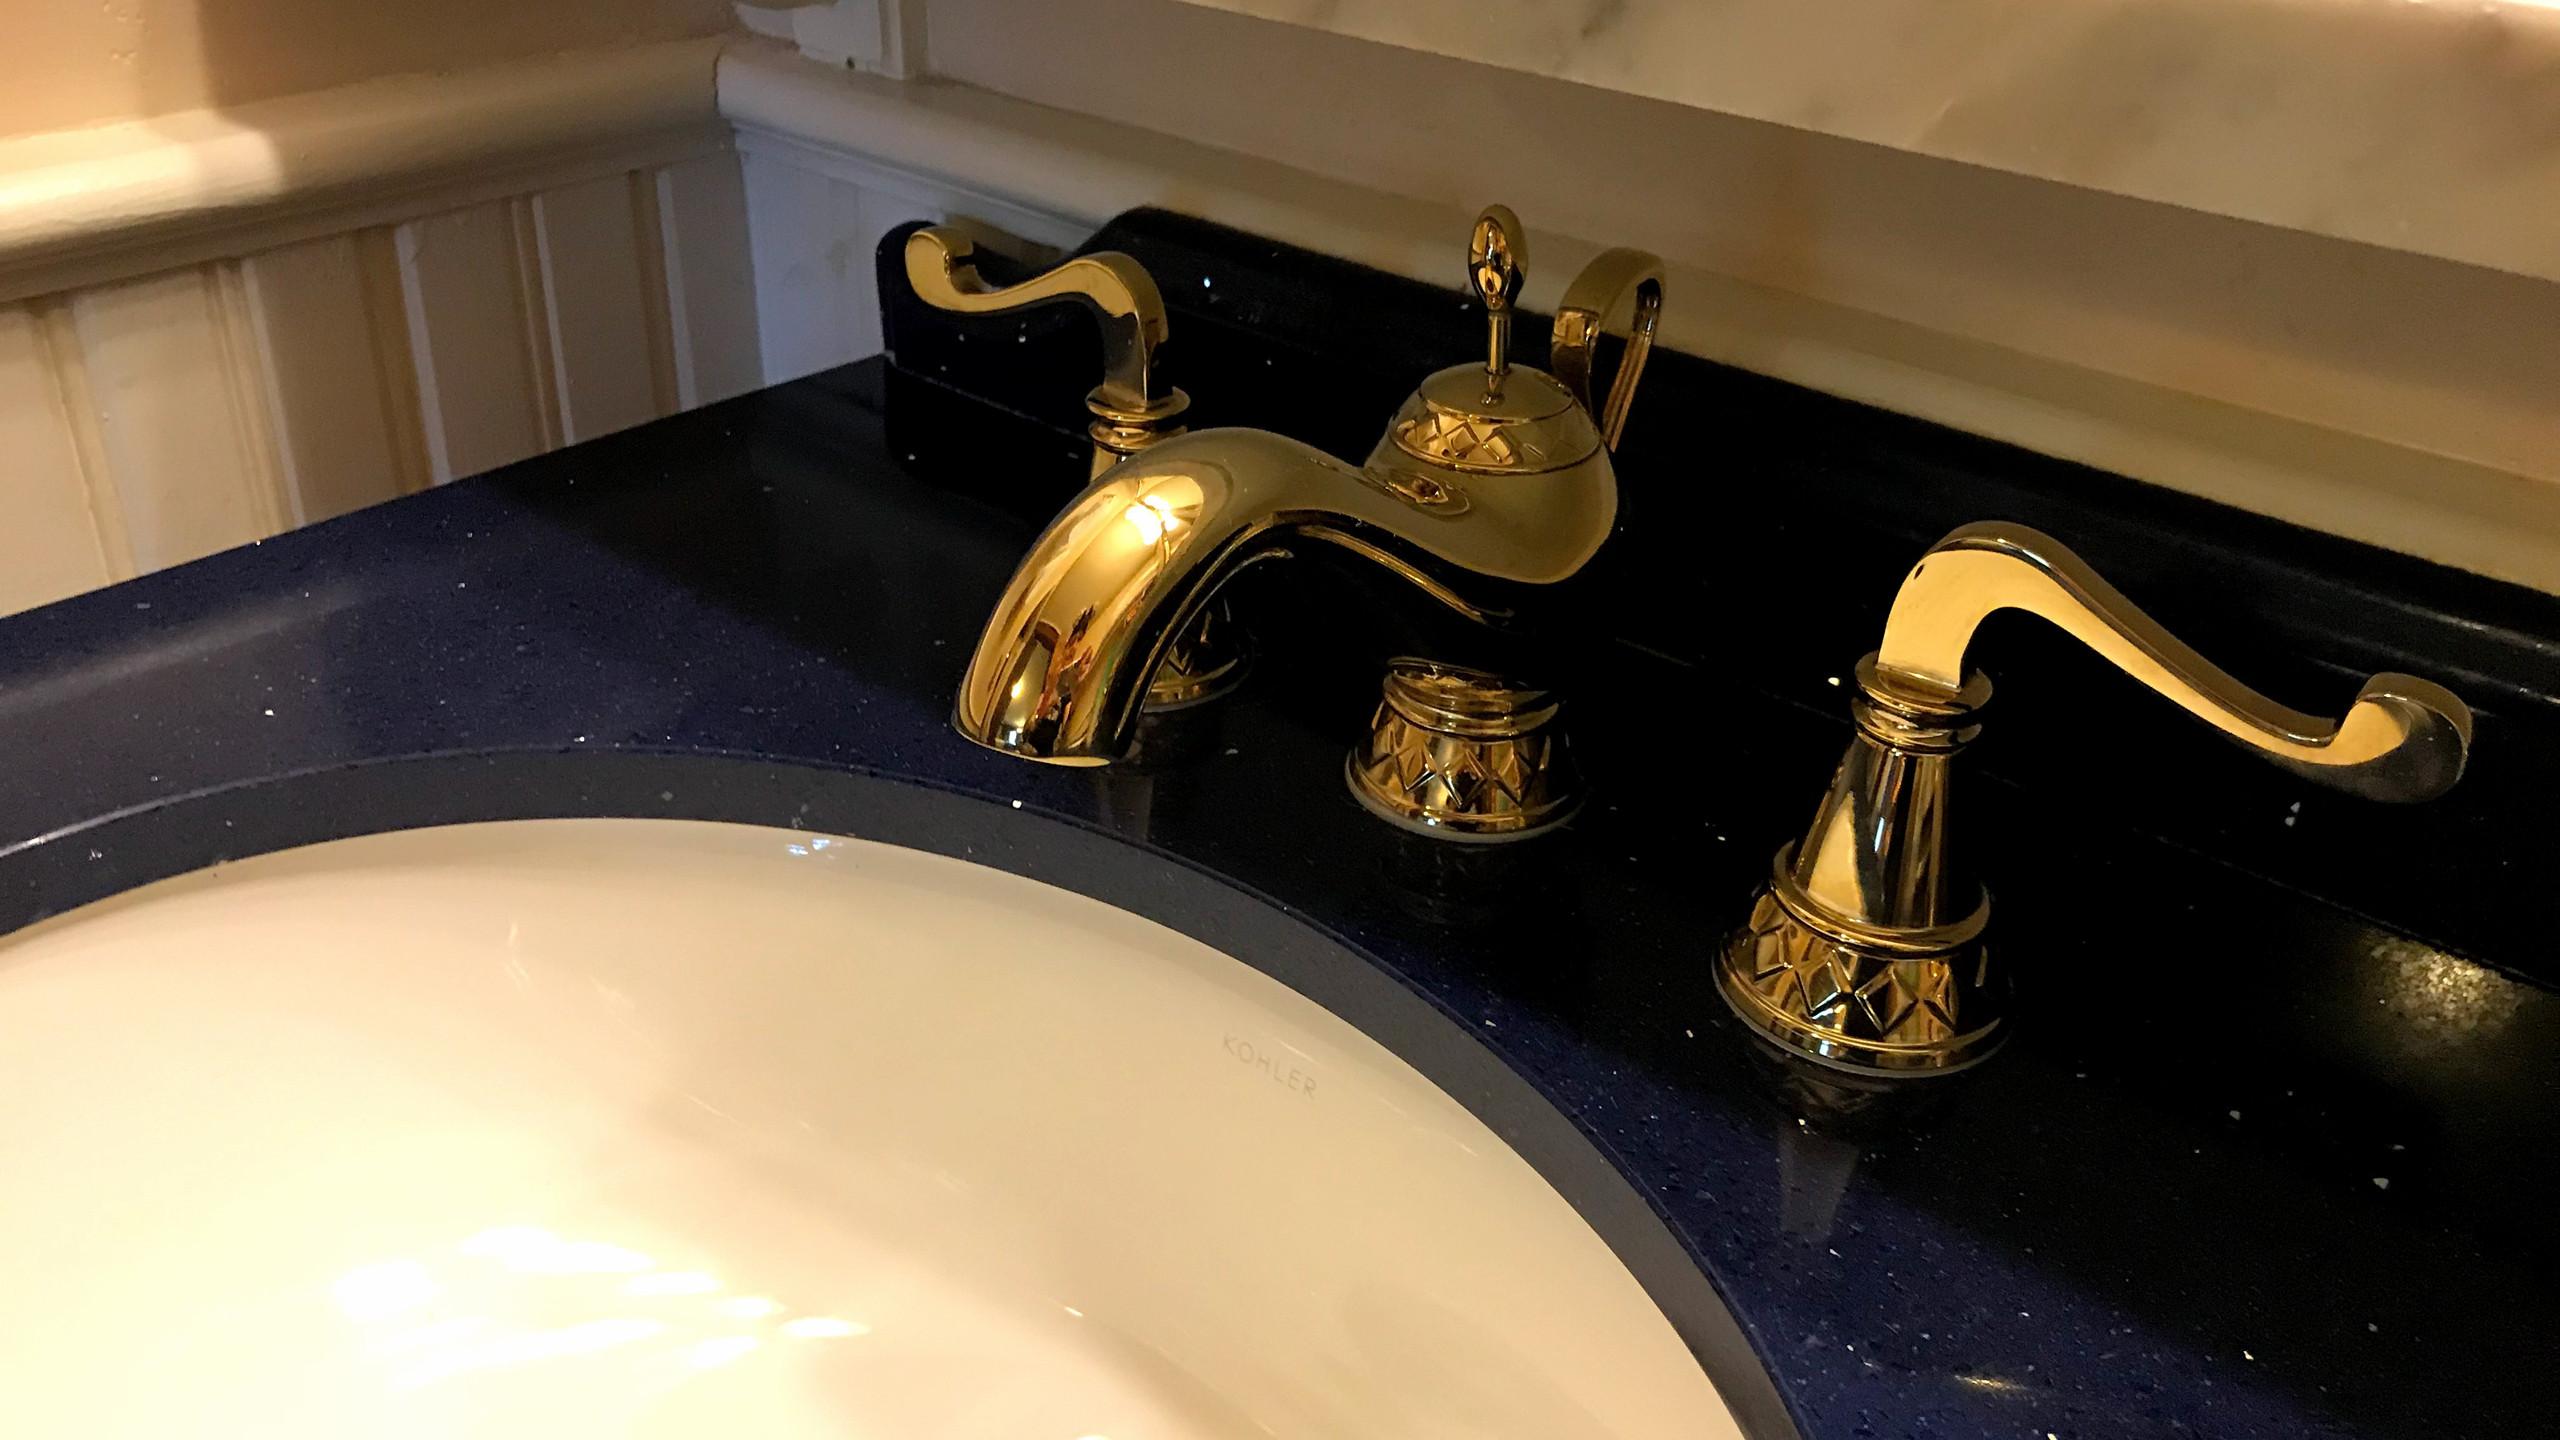 Aladdin Faucet